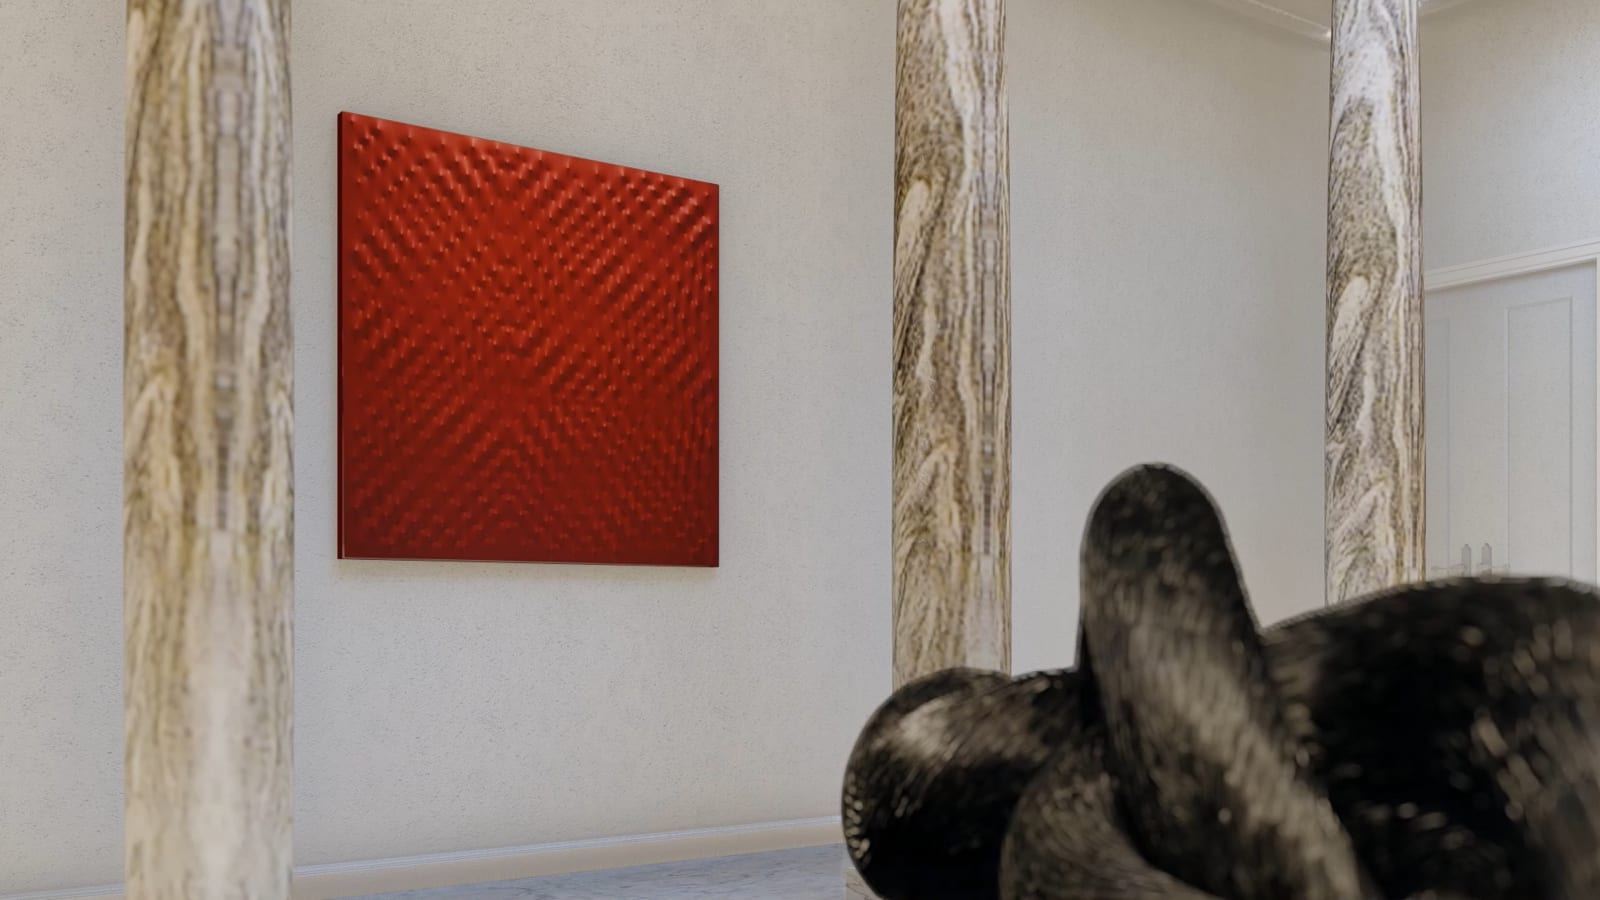 ENRICO CASTELLANI Superficie Rossa, 2007 150 x150 cm